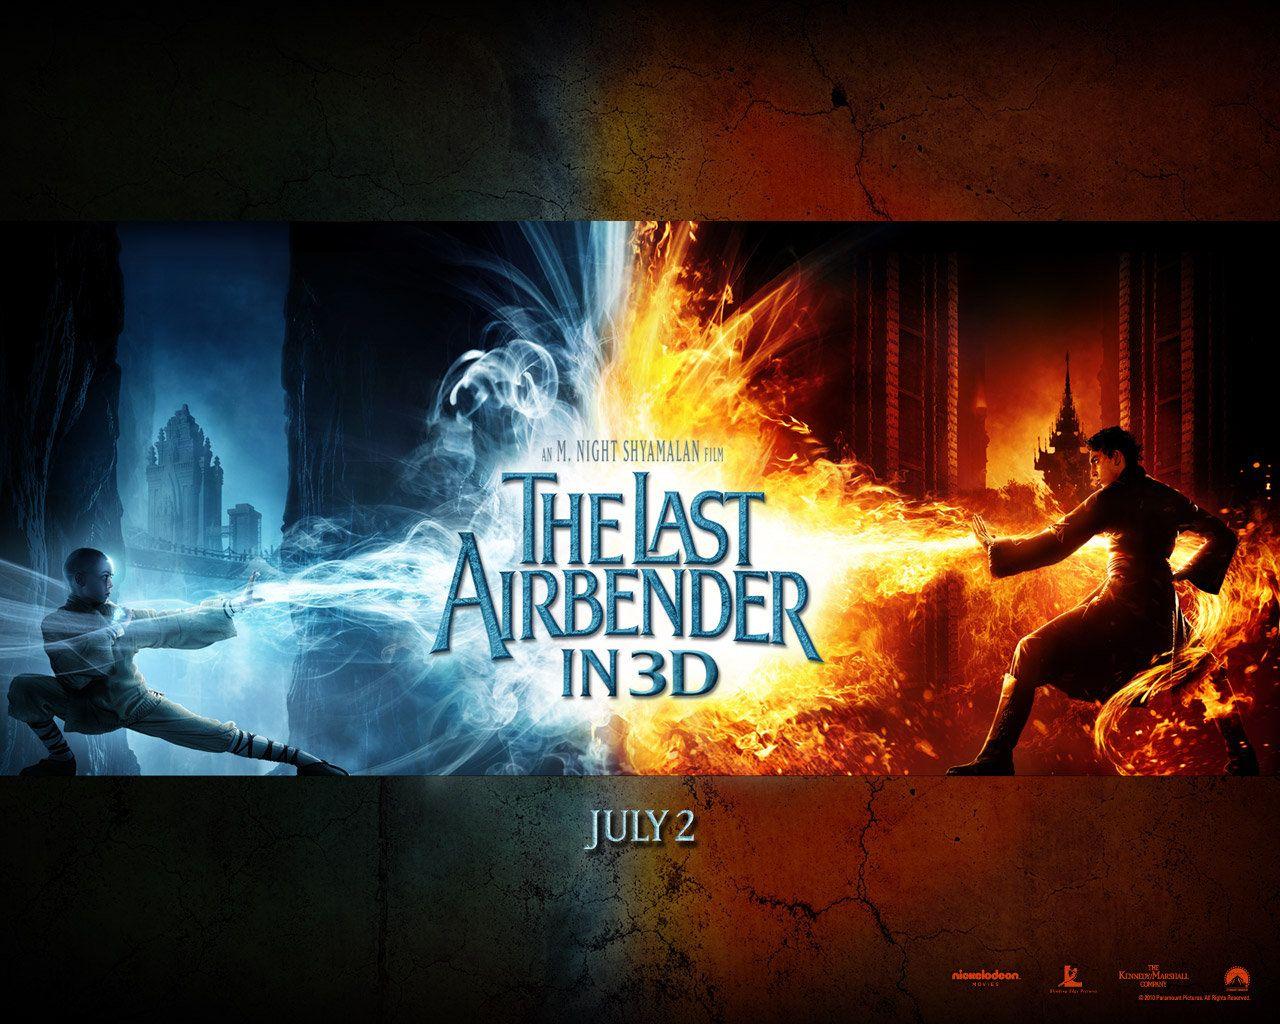 The Last Airbender 2010 Avatar The Last Airbender The Last Airbender Movie The Last Airbender